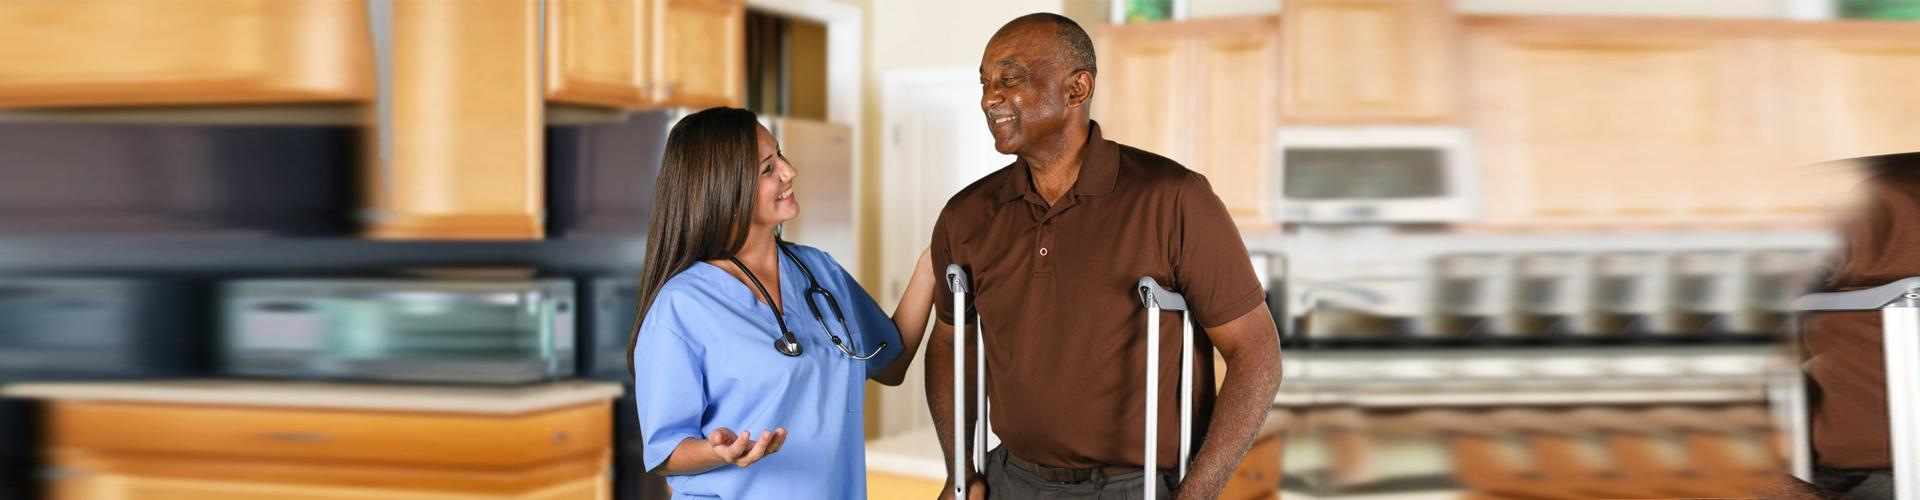 a nurse and a senior man talking